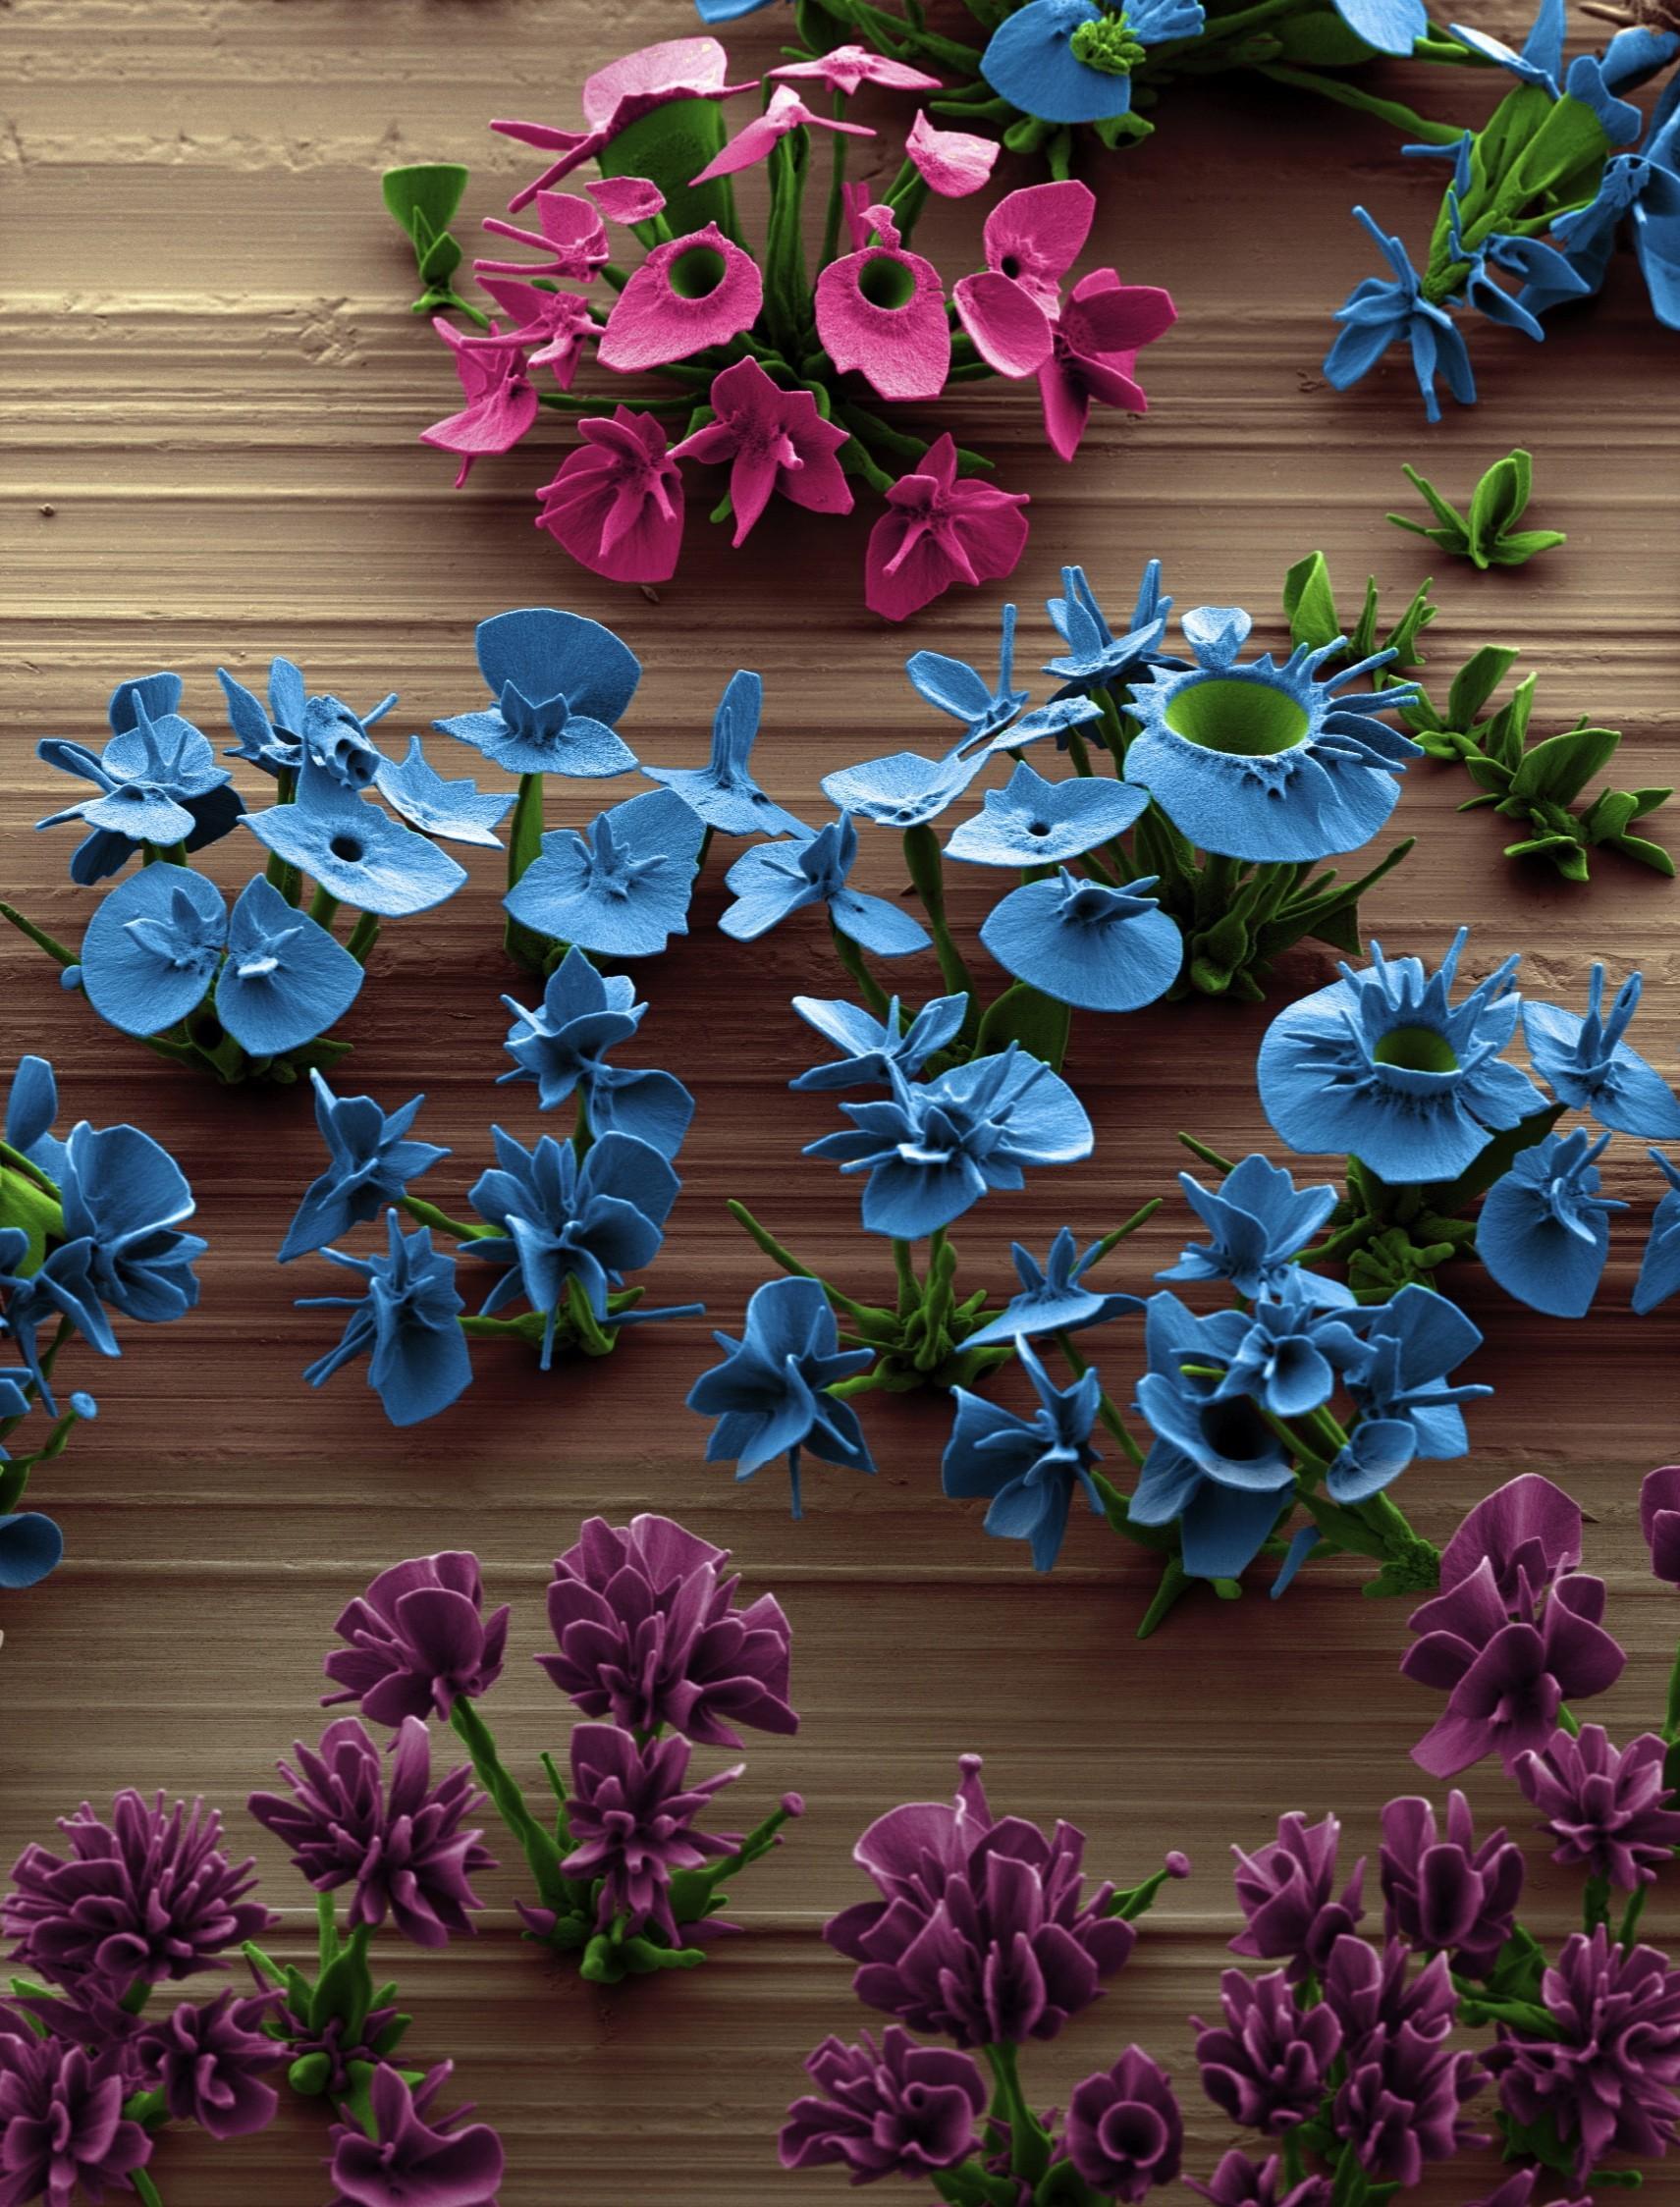 A garden of microscopic crystal flowers